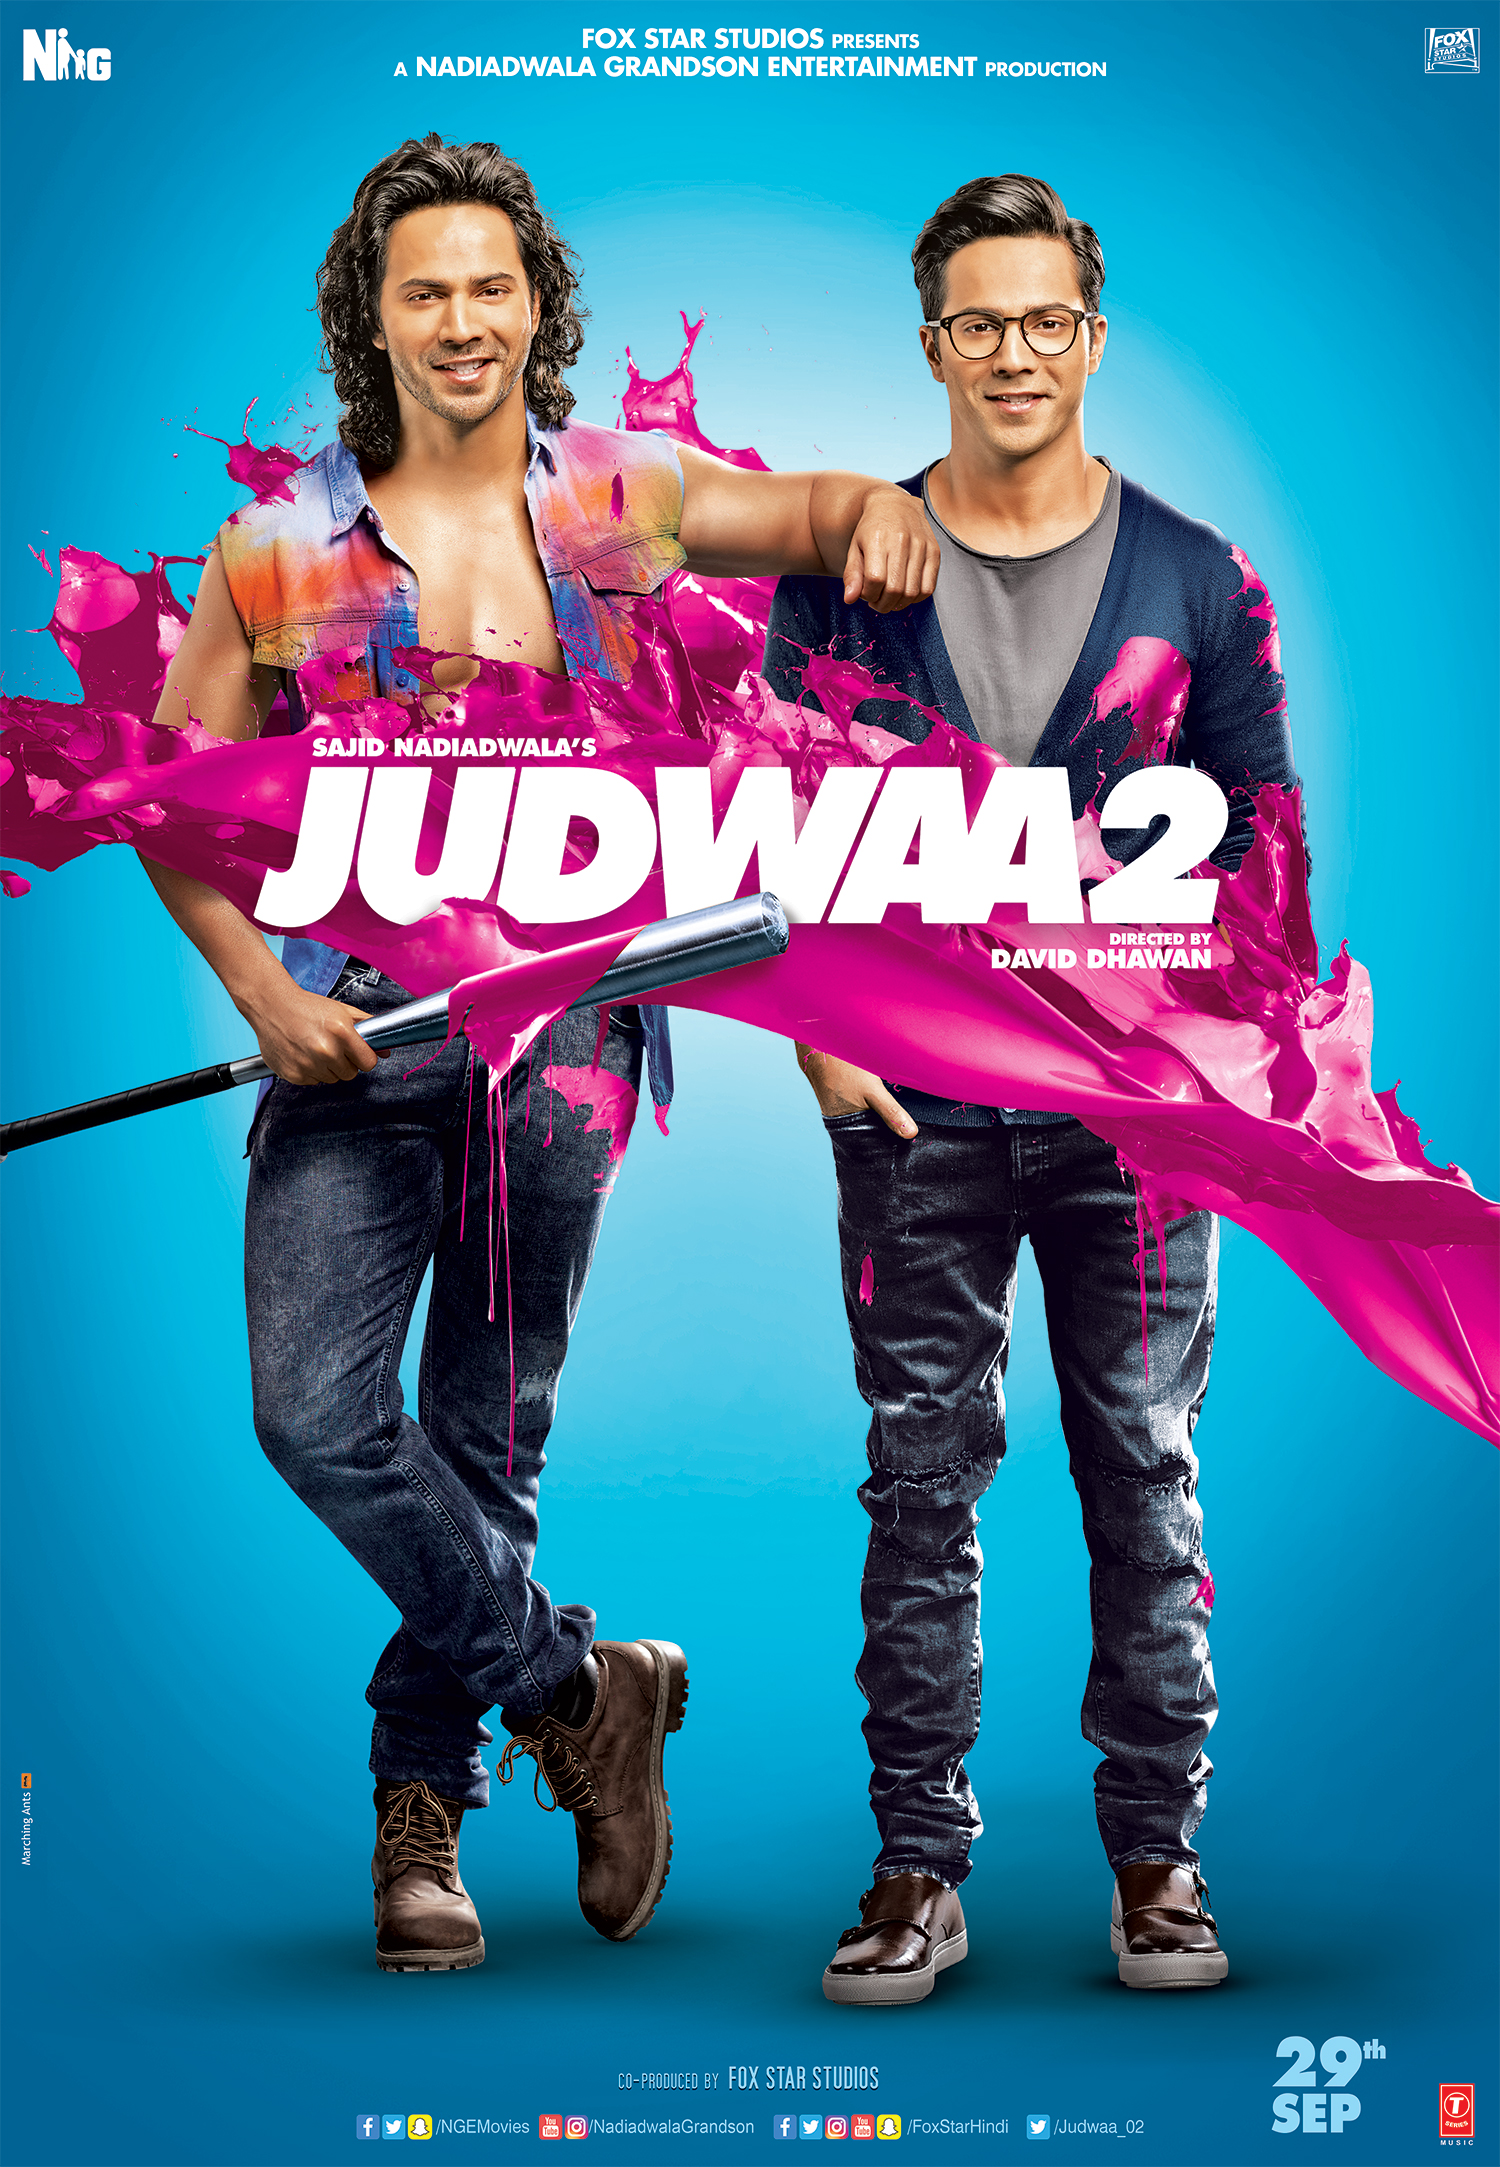 100 pairs, real Judwaas, launch. trailer, Judwaa 2, Varun dhawan, Tapsee pannu. Jacqueline Fernandez